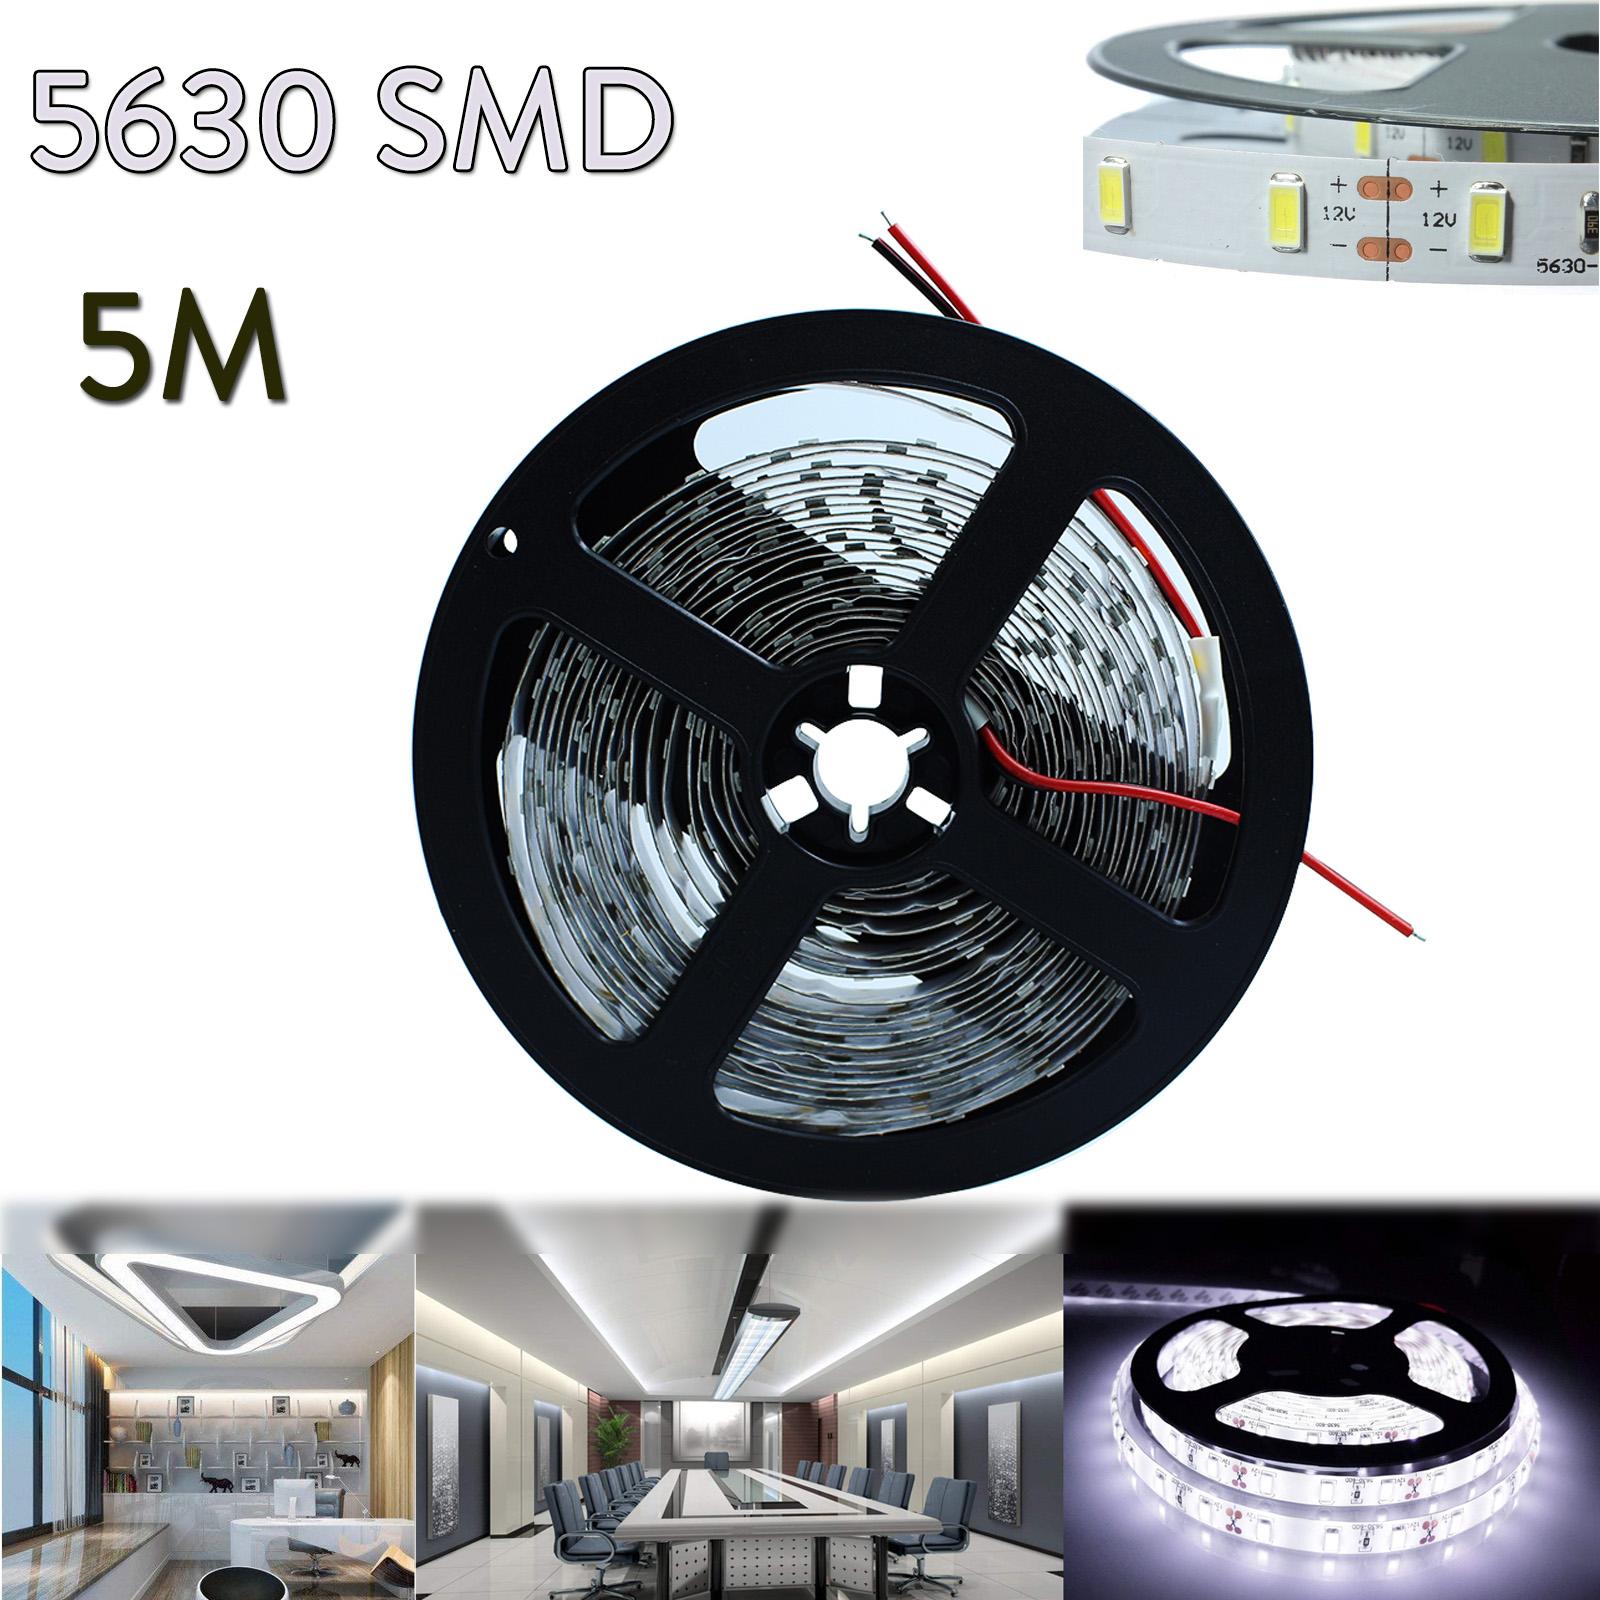 Waterproof 5M 5630 300Led SMD Cool White Flexible Light Strip Super Bright DC12V